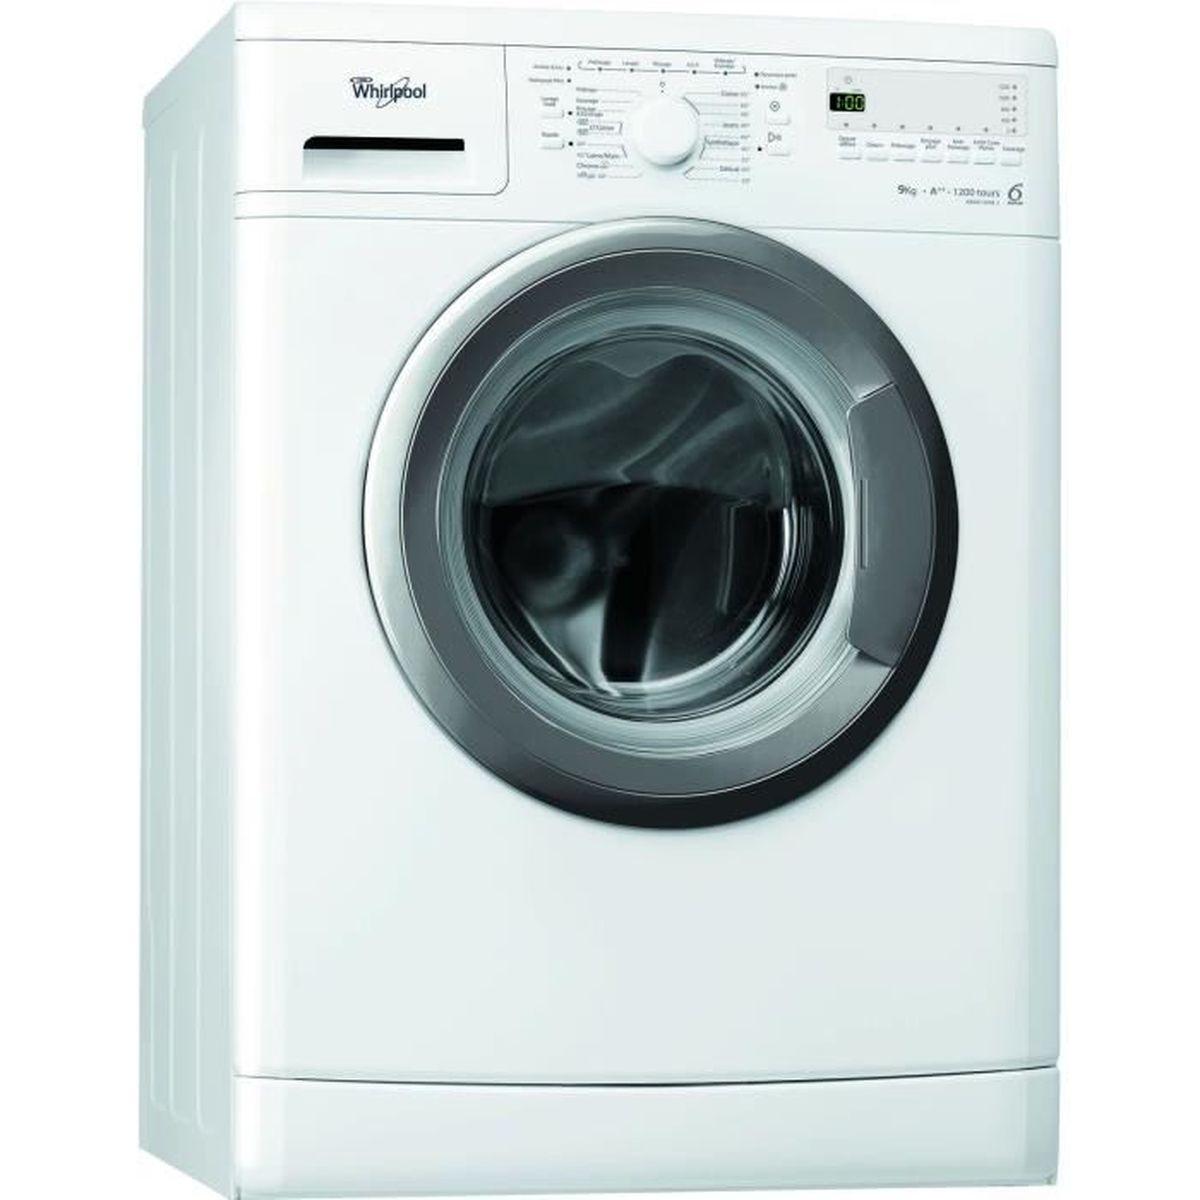 LAVE-LINGE WHIRLPOOL - AWOD2928.1 - Machine à laver frontale